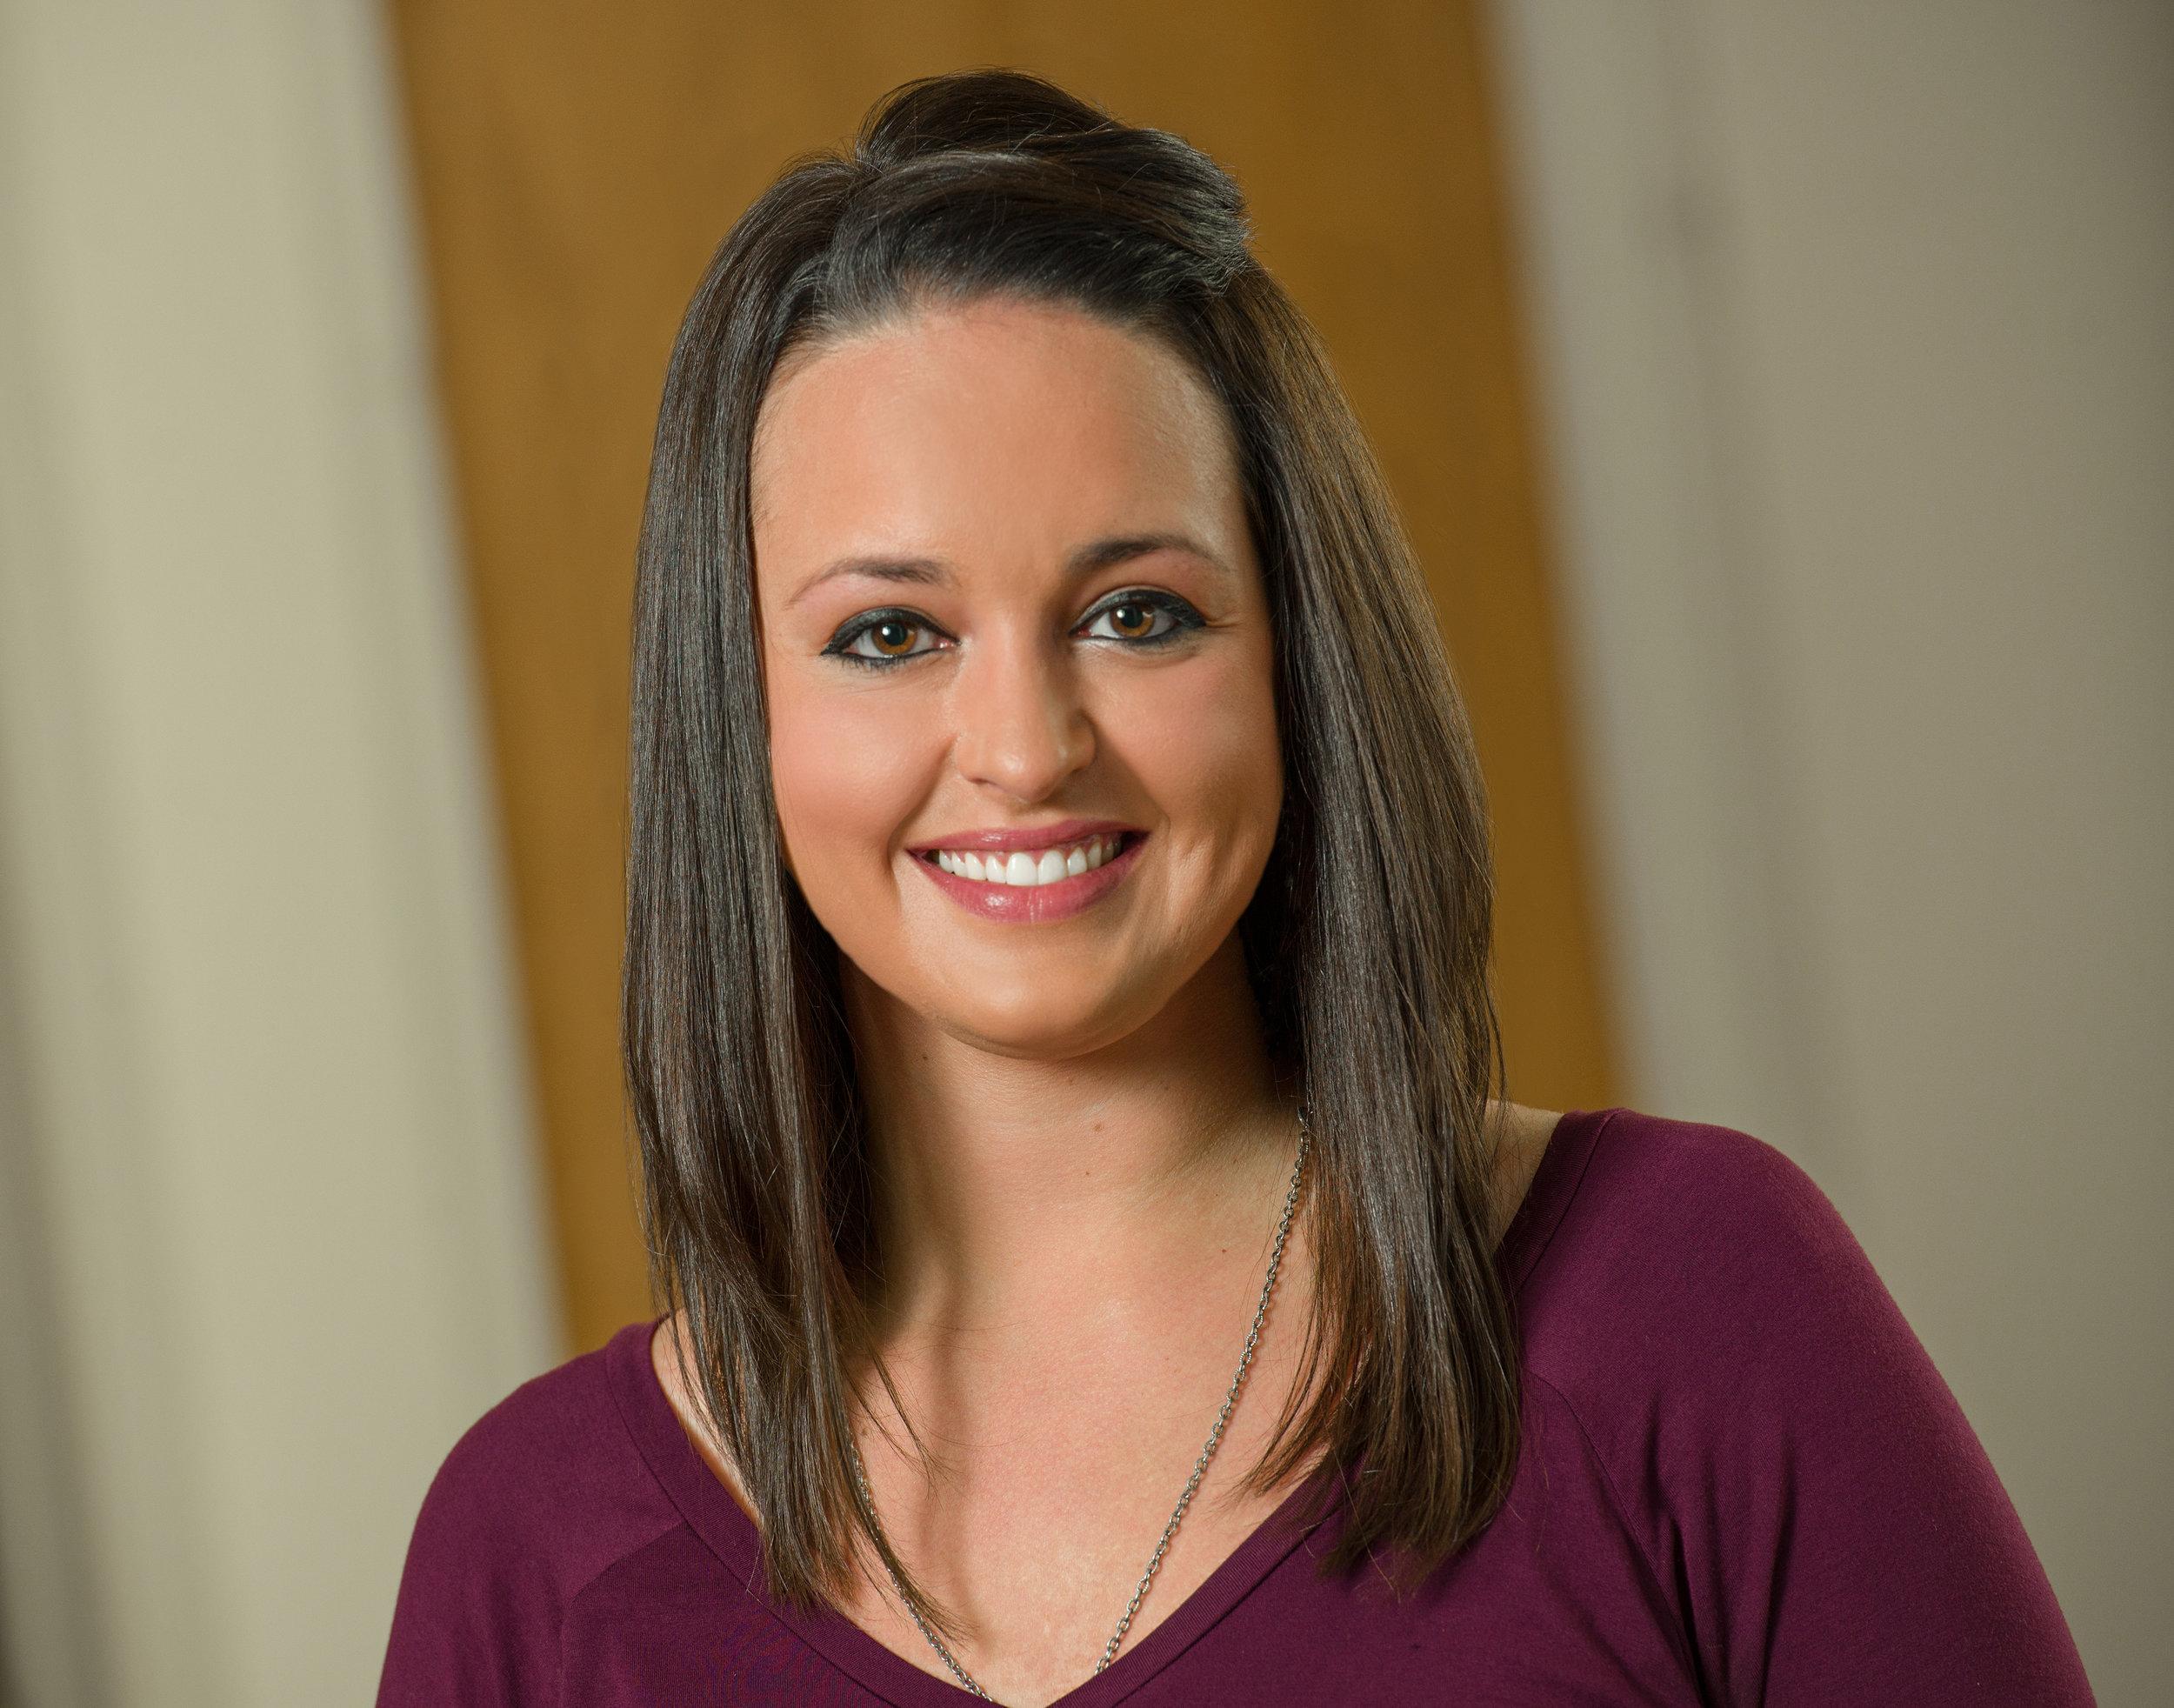 Jessica Haszlauer - Administrative Assistant